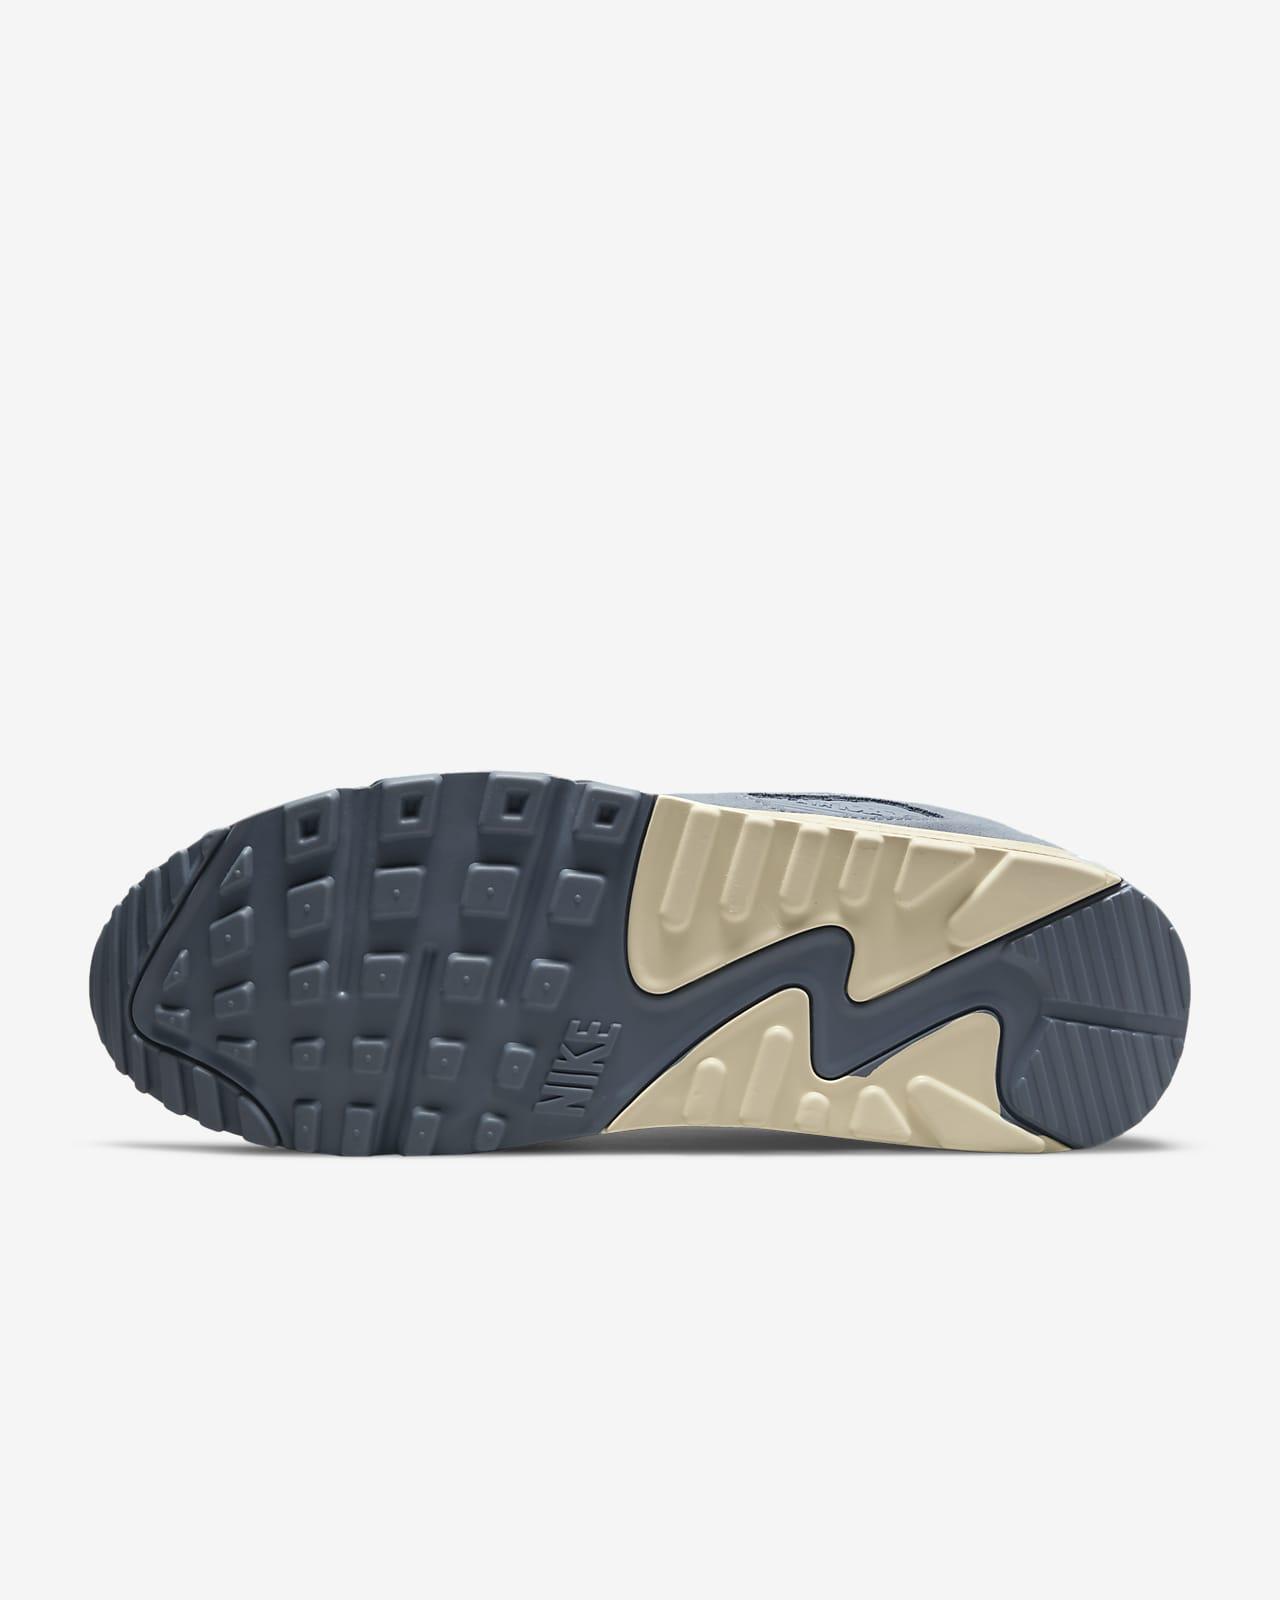 Nike Air Max 90 Premium Men's Shoes. Nike SA